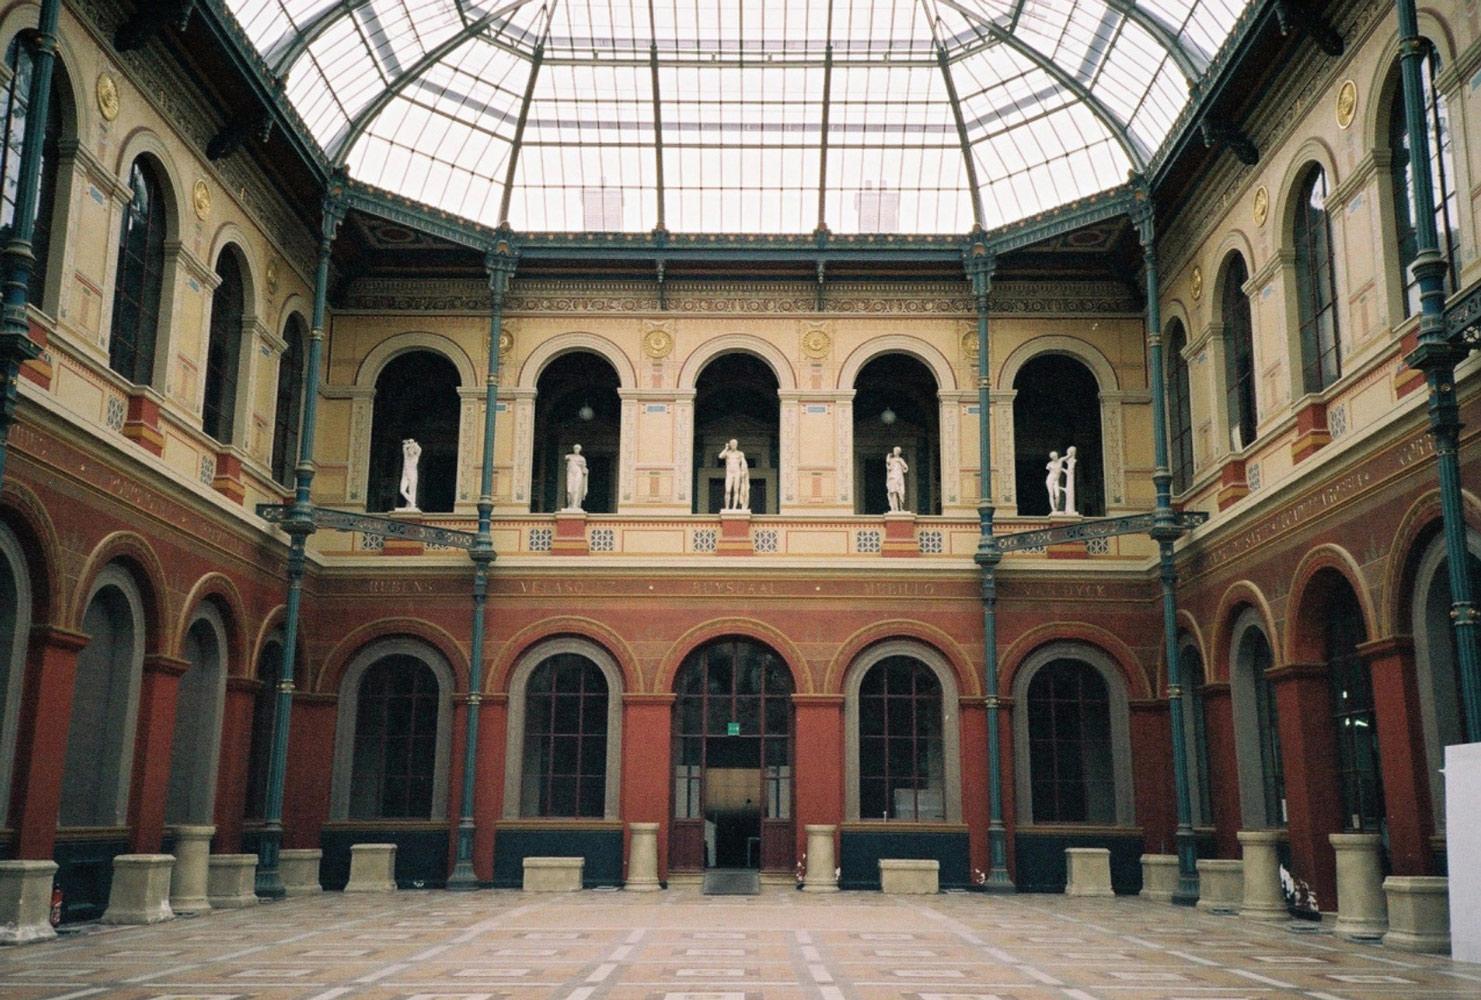 daniella-benedetti-paris-blog-6.jpg